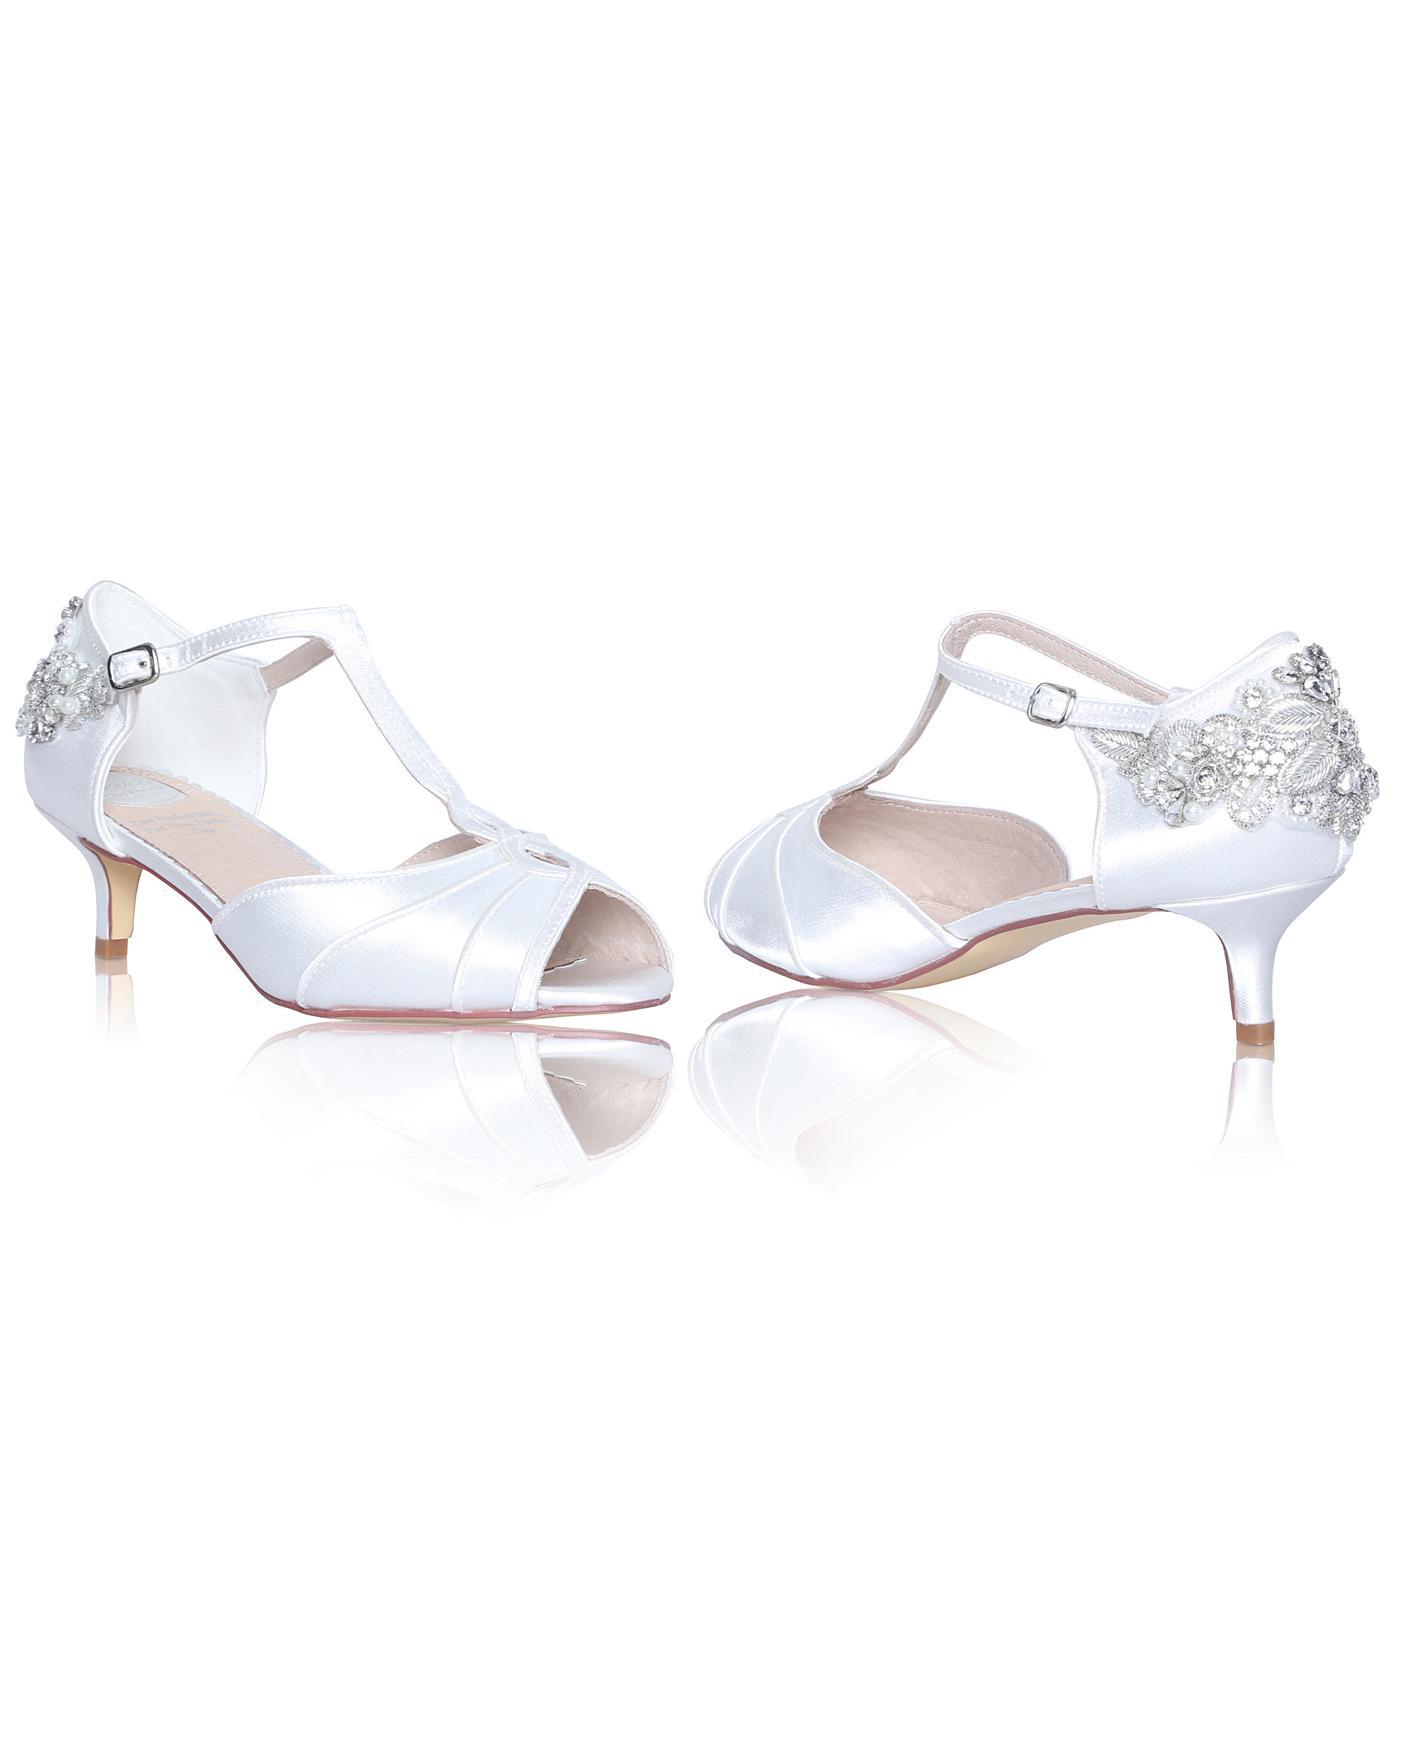 9c89b37708e4c Perfect Georgie Low Heel Sandal | VivaLaDiva.com